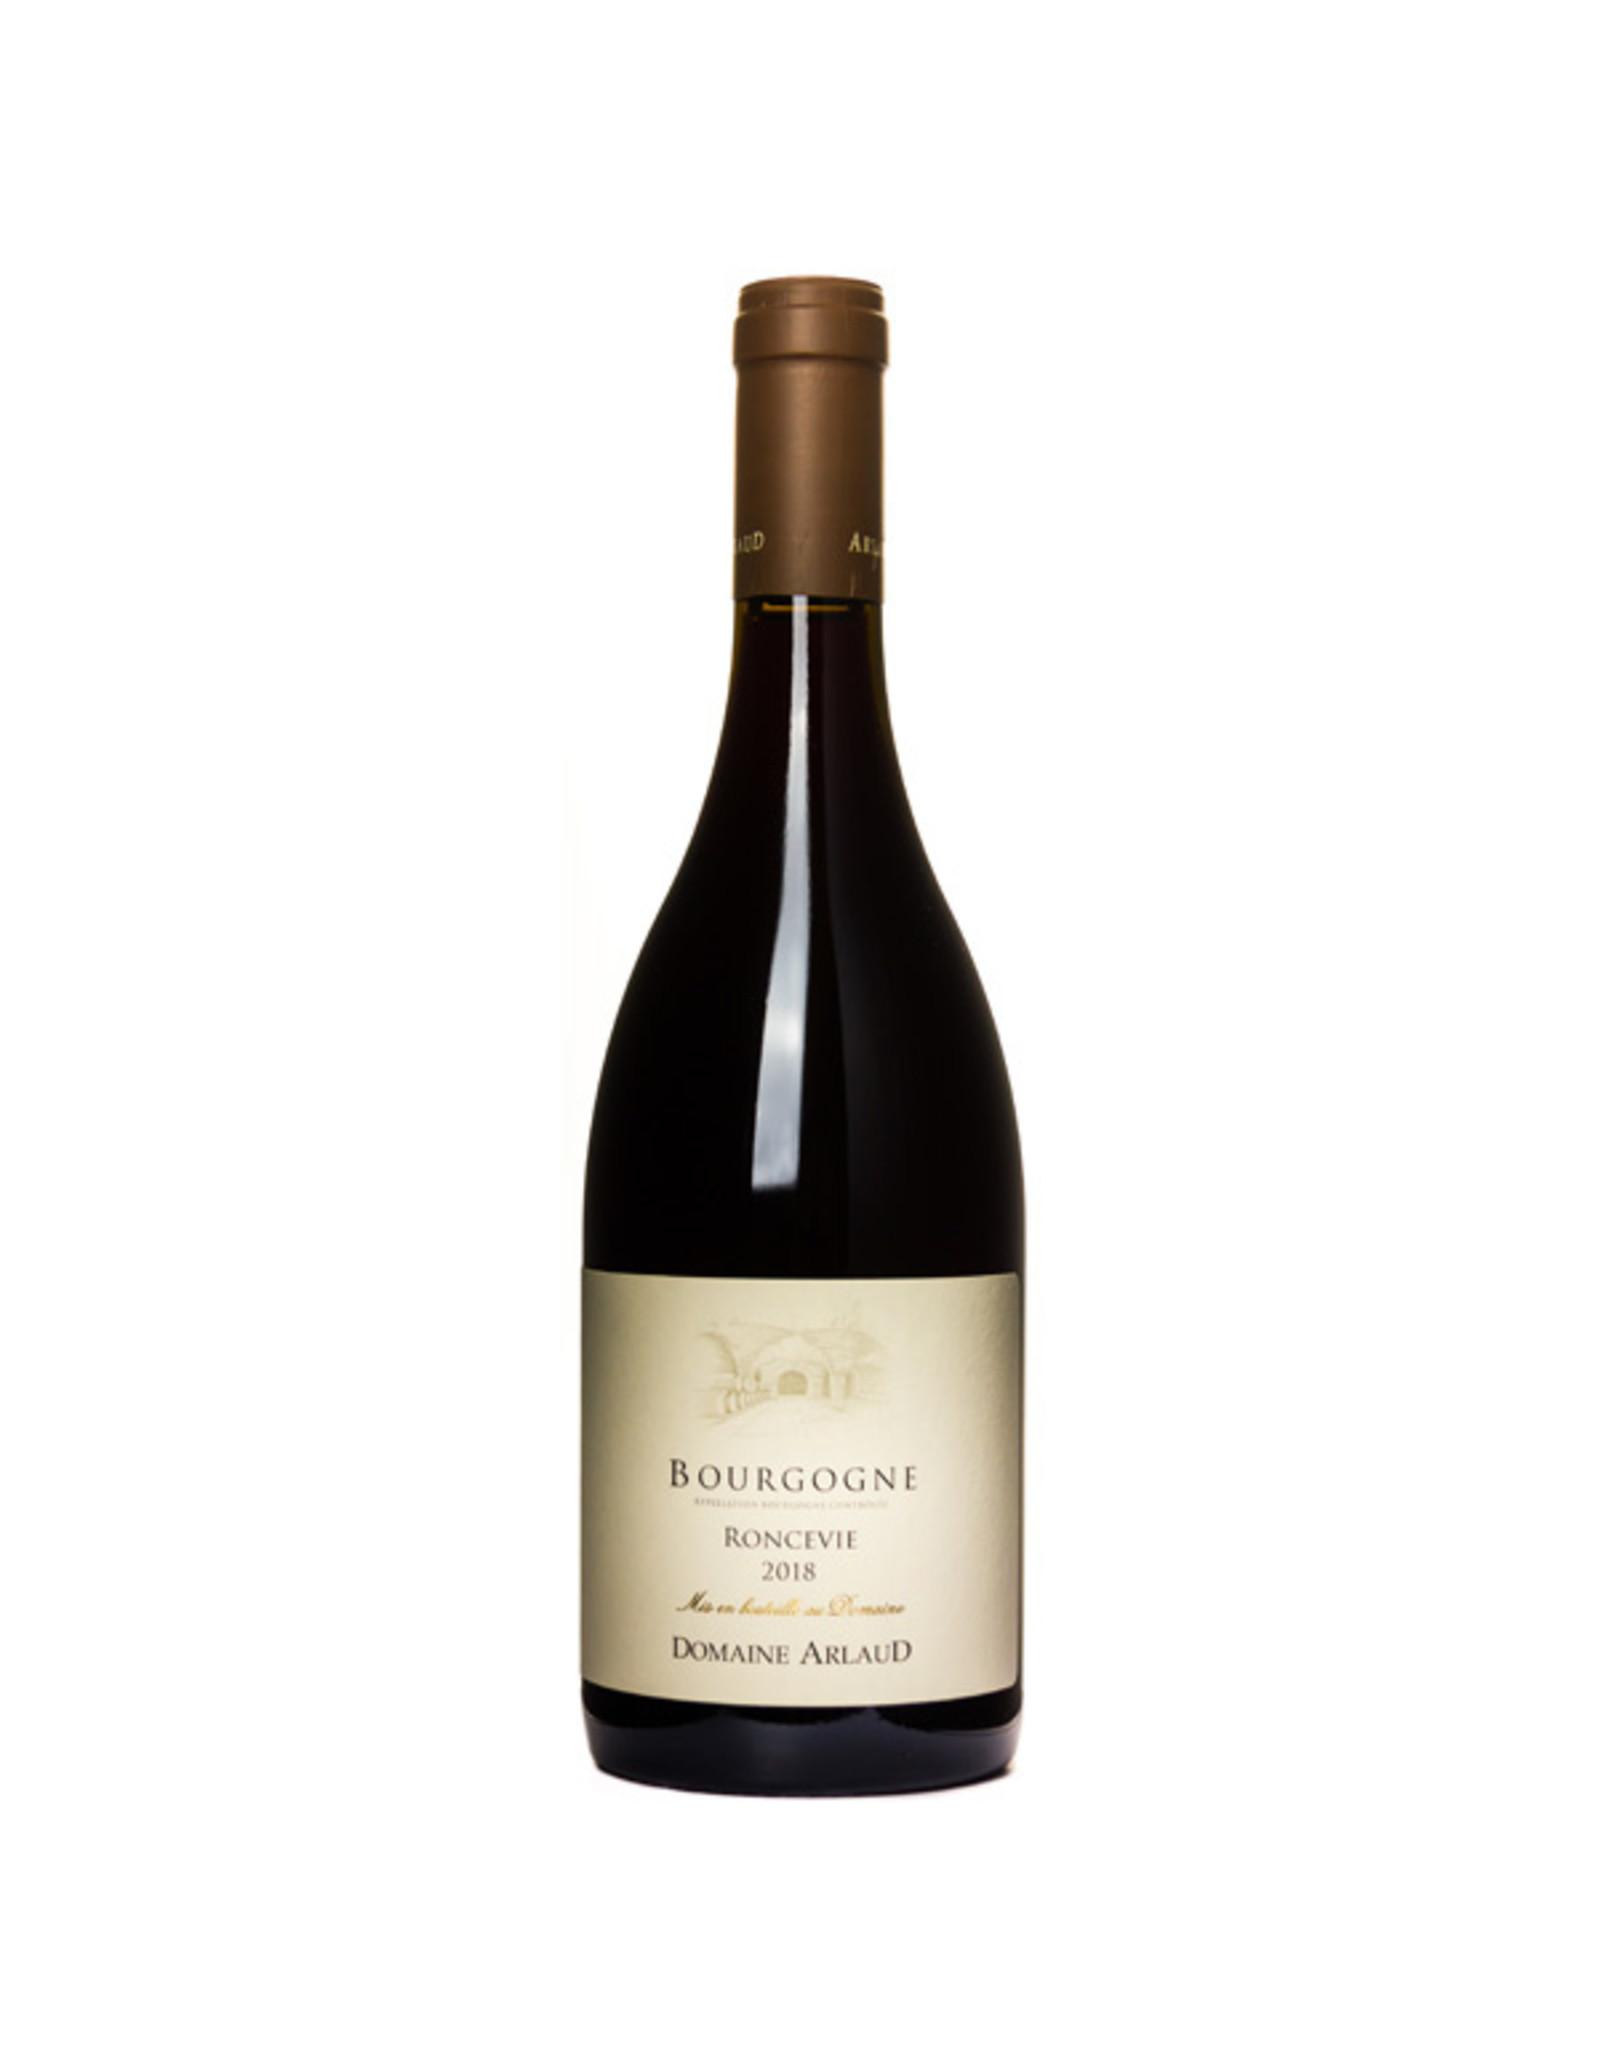 Domaine Arlaud, Morey-Saint-Denis Arlaud Bourgogne Pinot Noir 'Roncevie' 2018